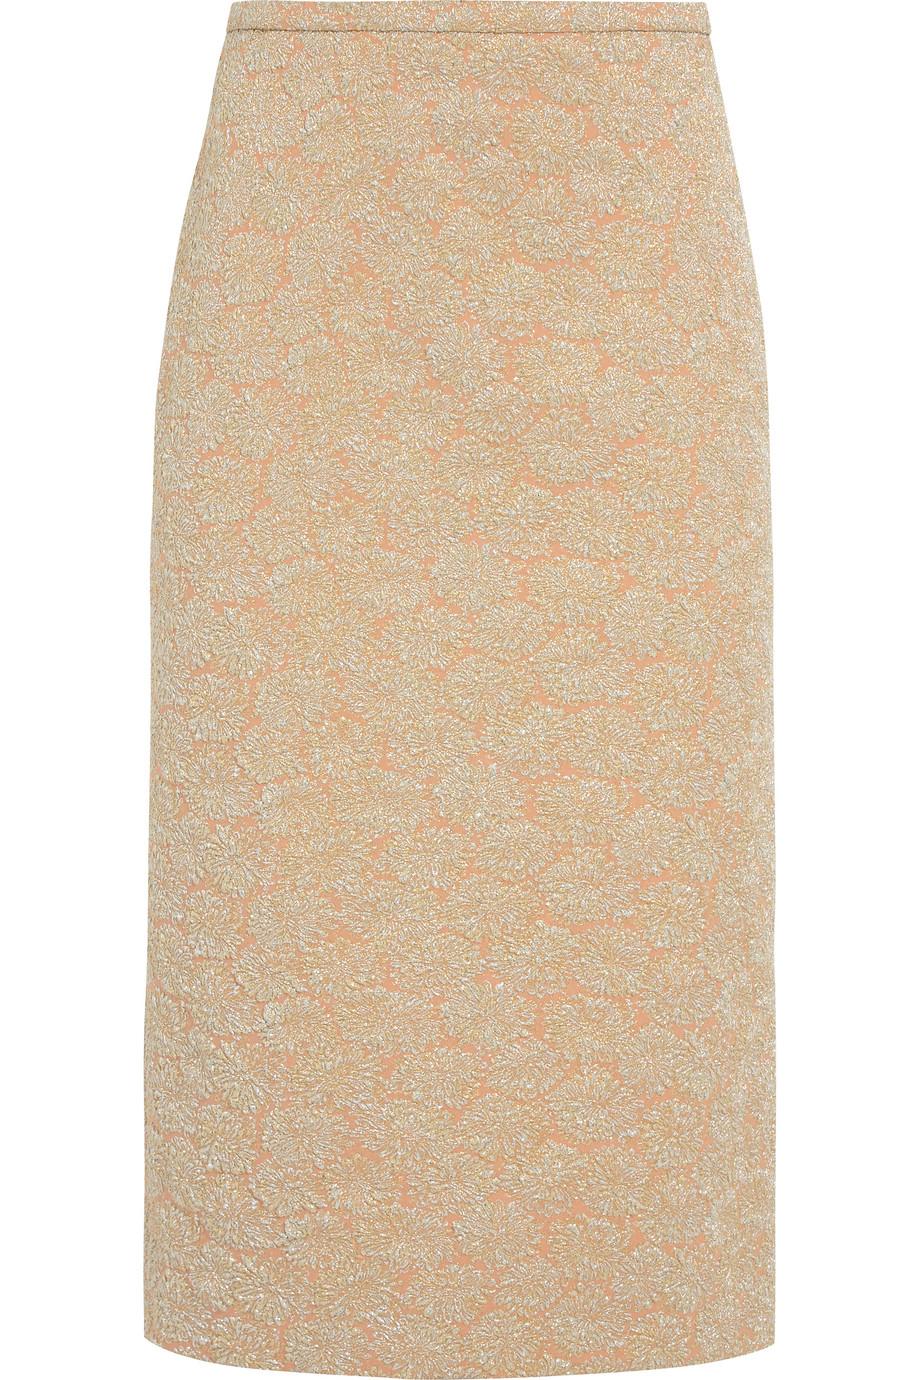 Rochas Metallic Brocade Midi Skirt, Peach, Women's, Size: 40